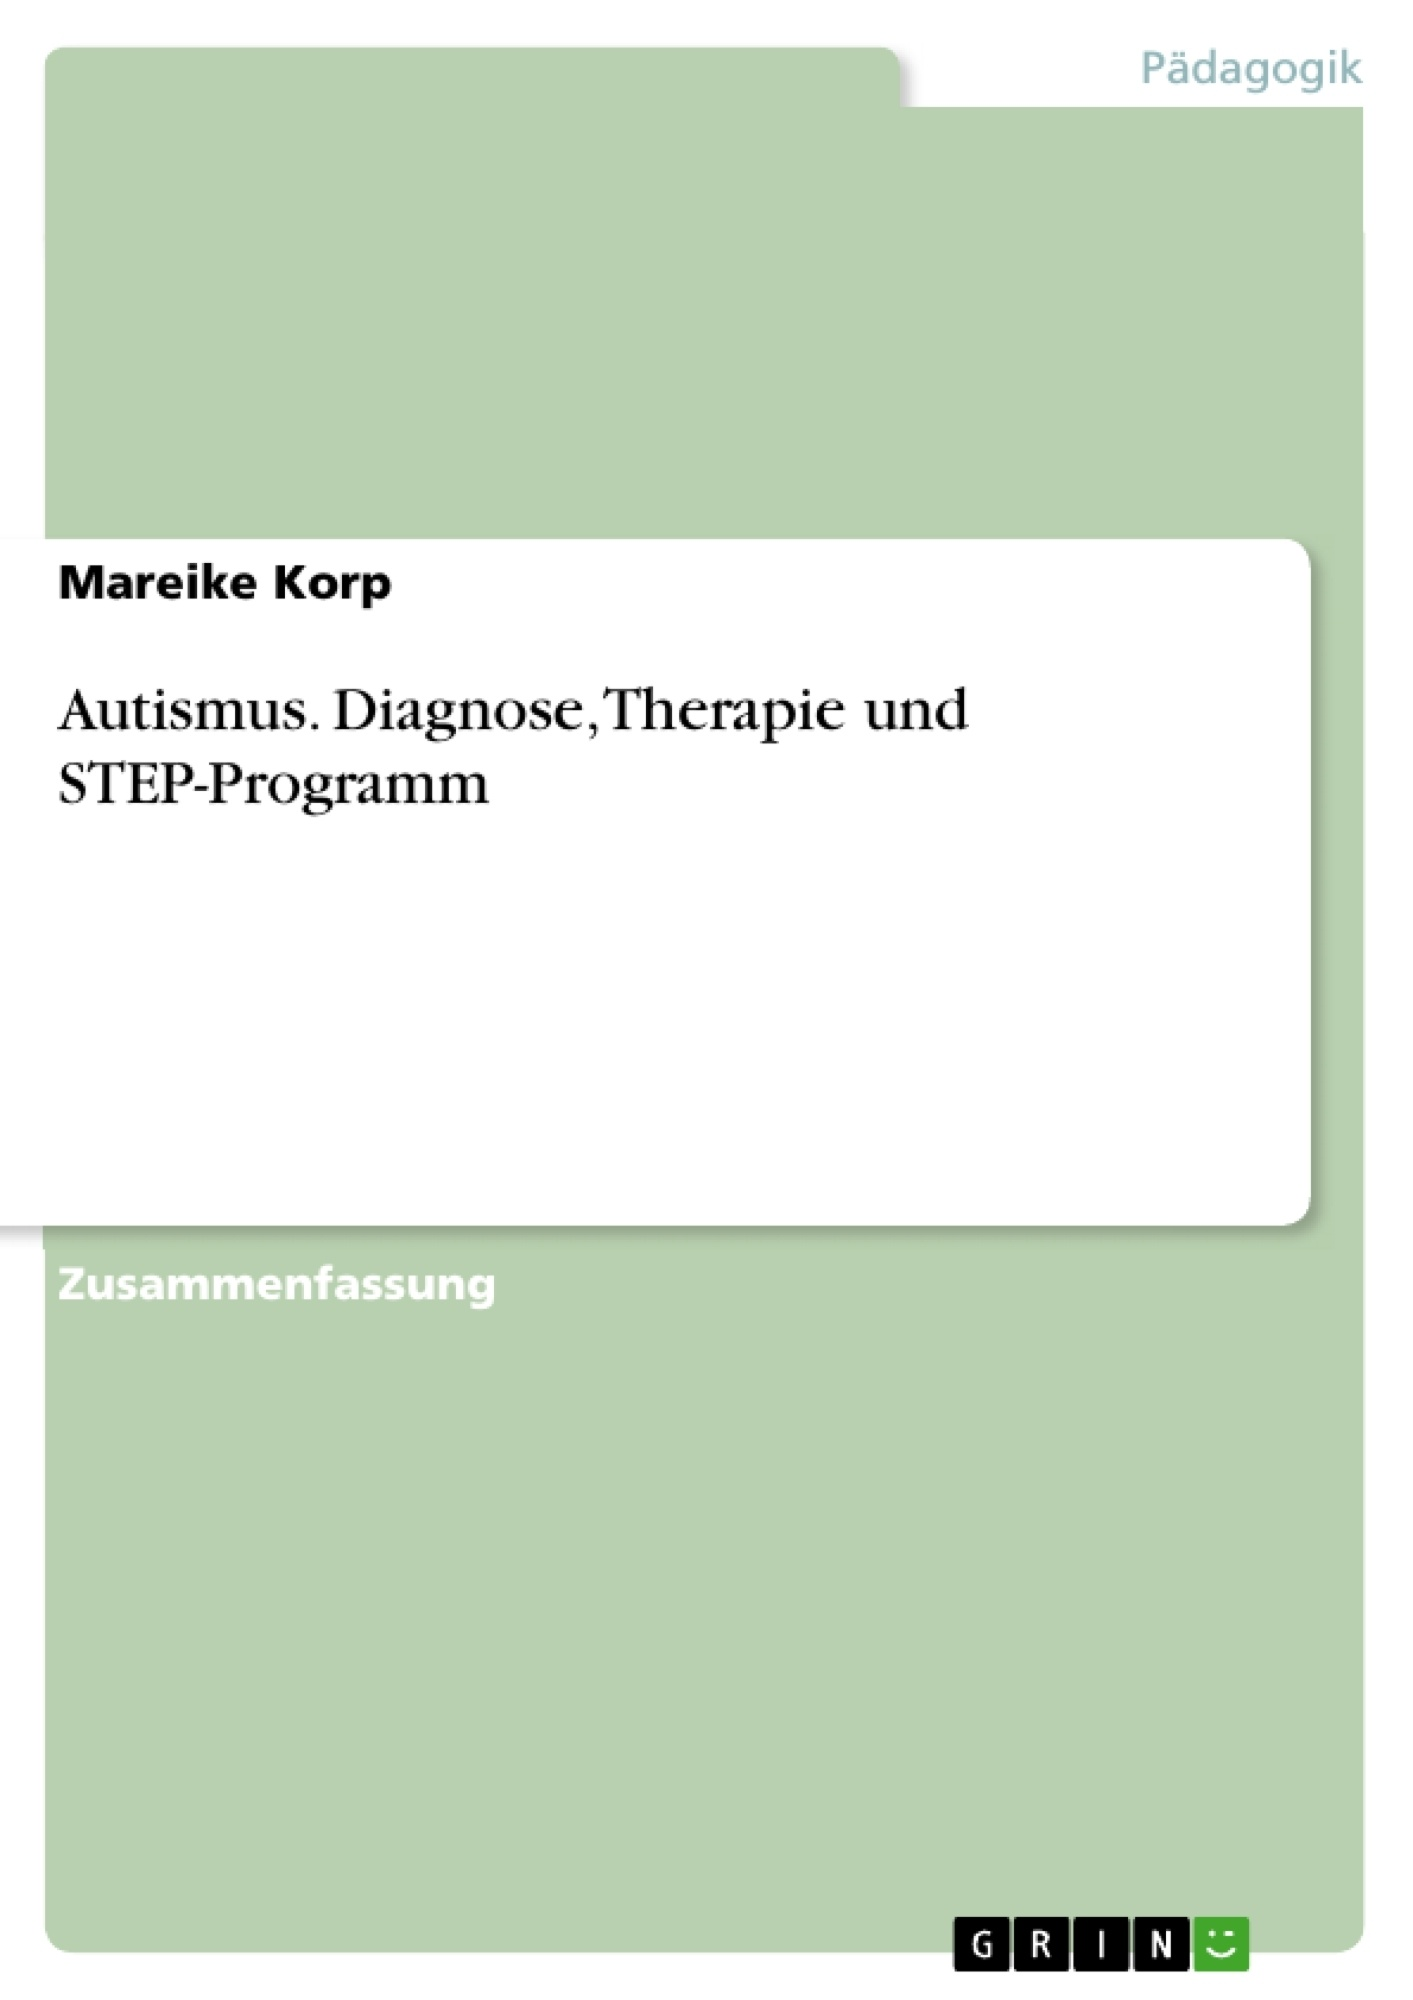 Titel: Autismus. Diagnose, Therapie und STEP-Programm